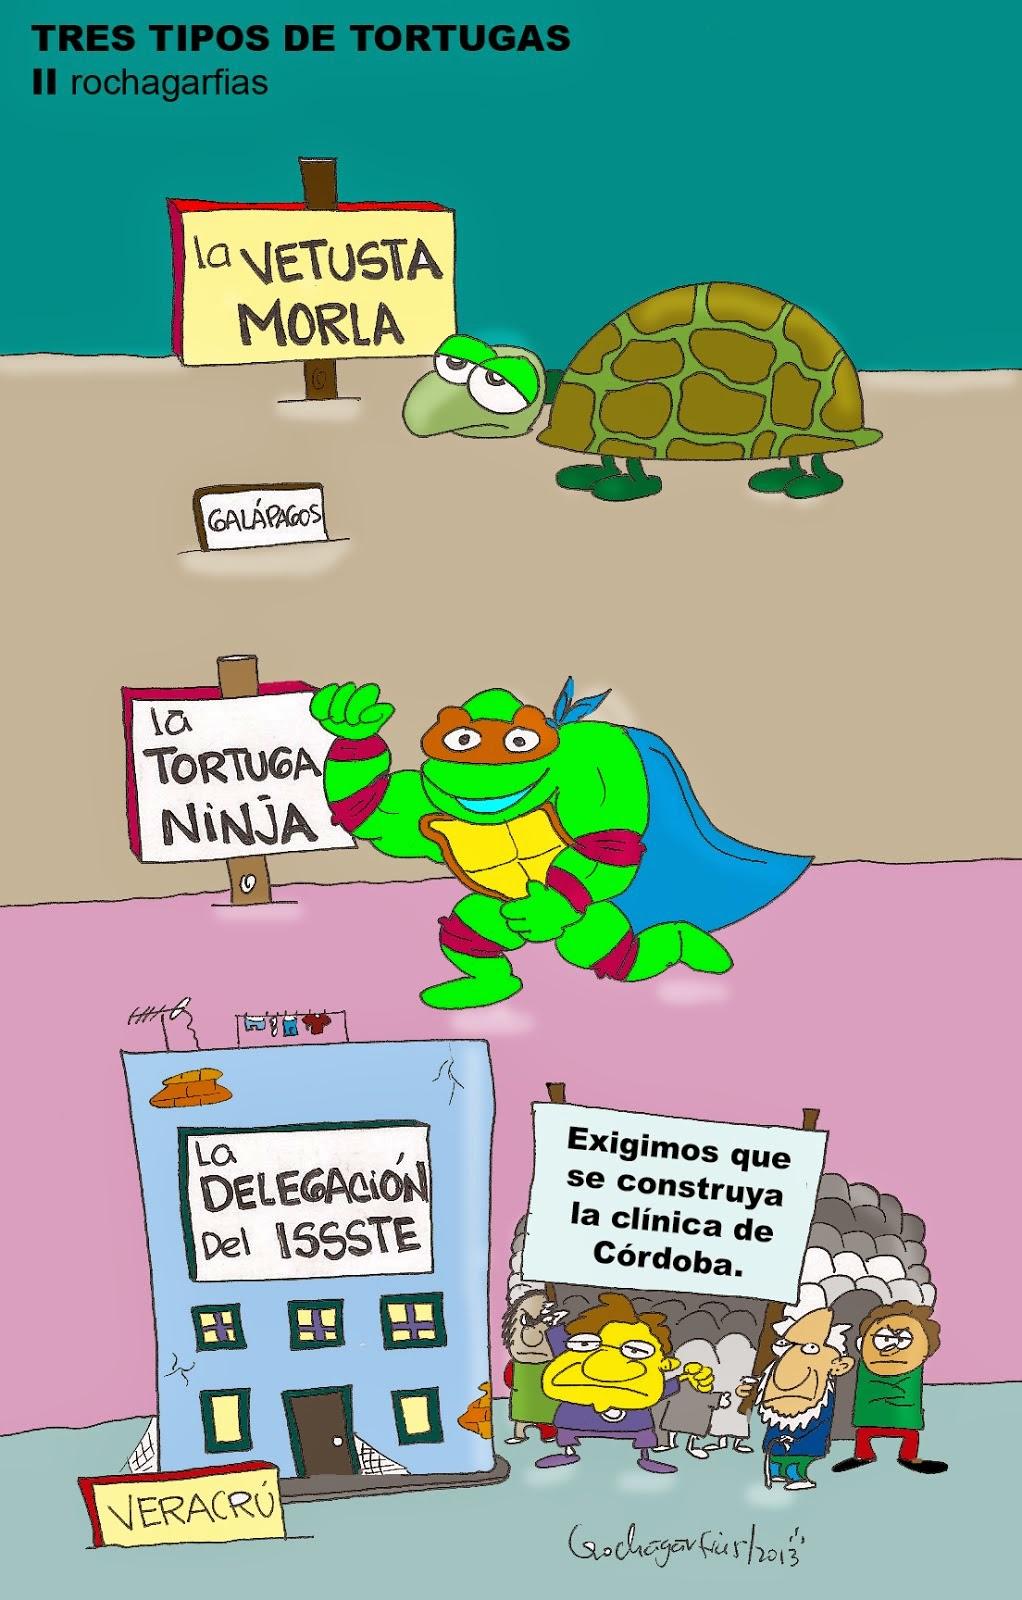 Tres tipos de tortugas.